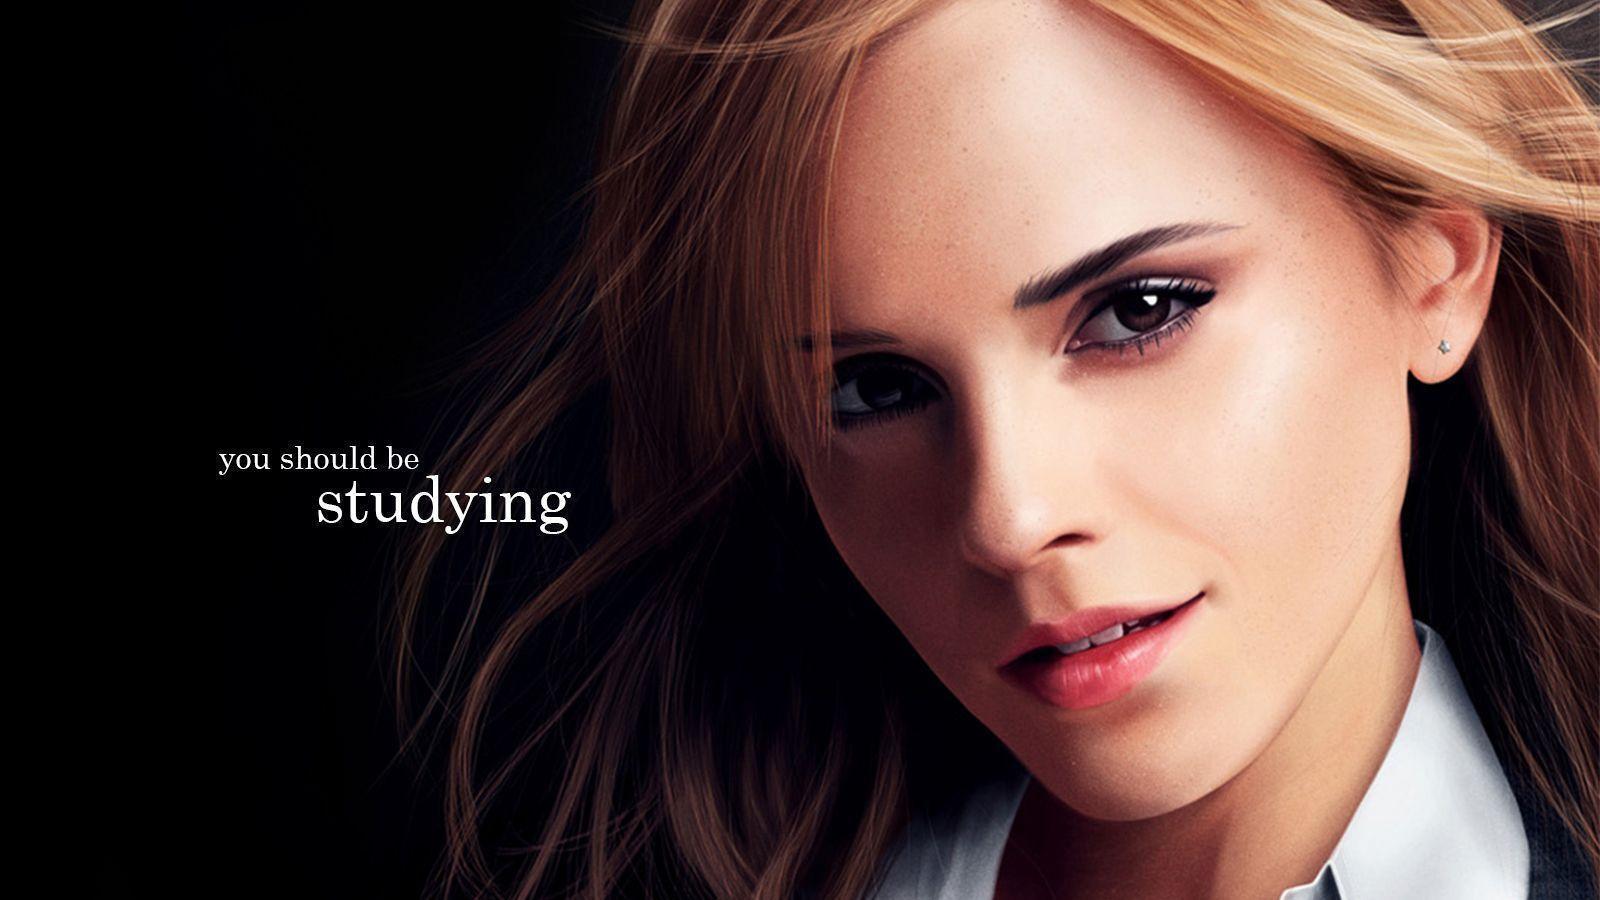 Emma Watson HD Wallpapers - HD Wallpapers of Emma Watson - Page 1 ...